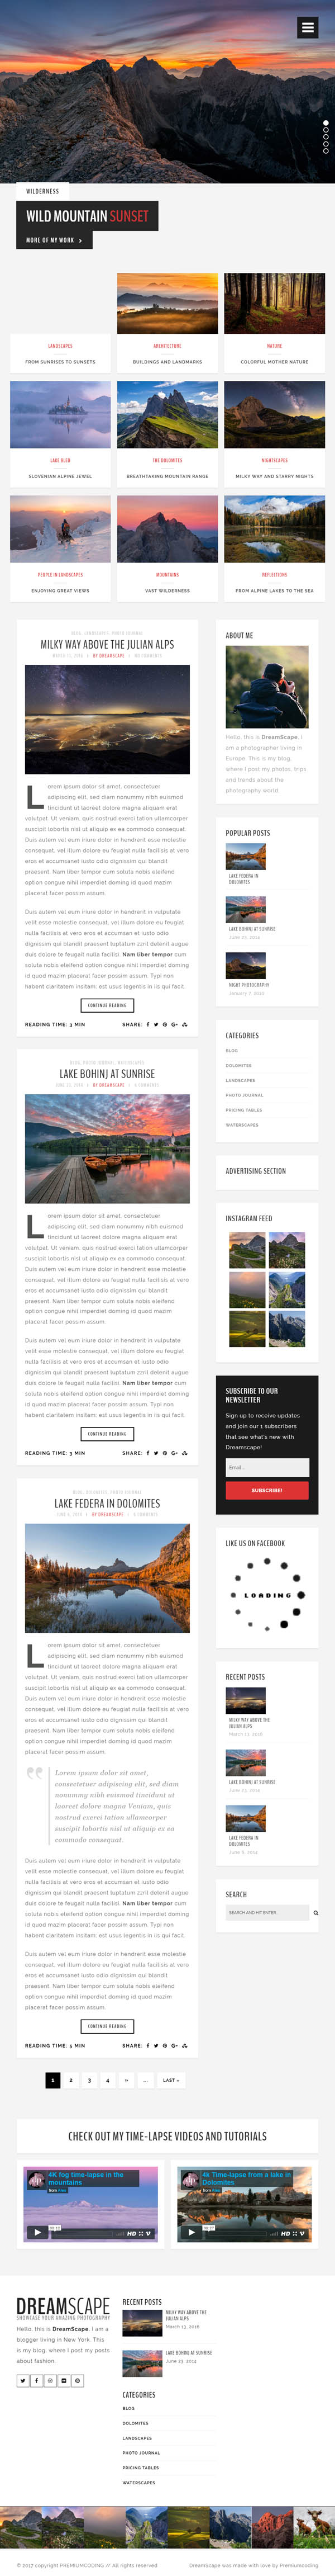 Dreamscape Photography - A Responsive WordPress Photography Blog Theme